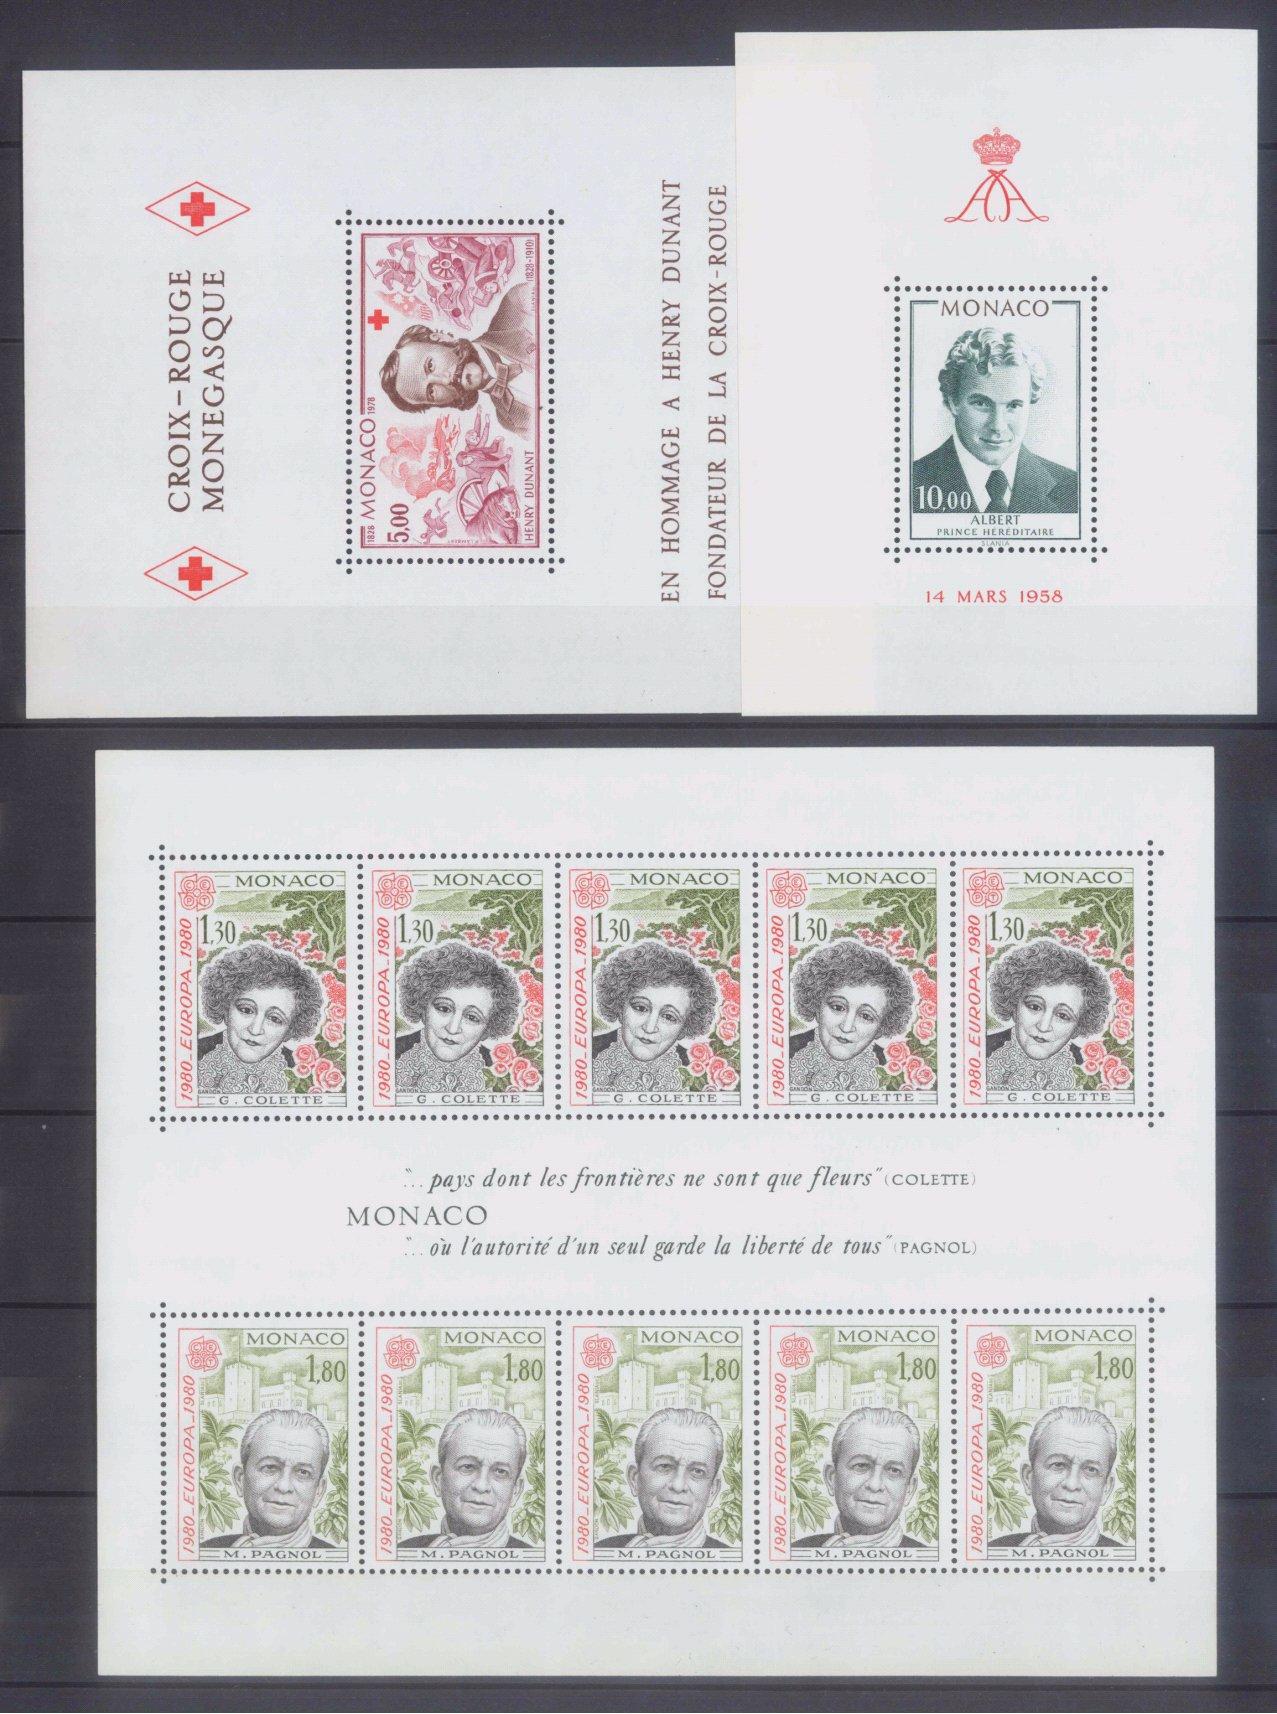 MONACO 1953-1989, Katalogwert 970,- Euro-3